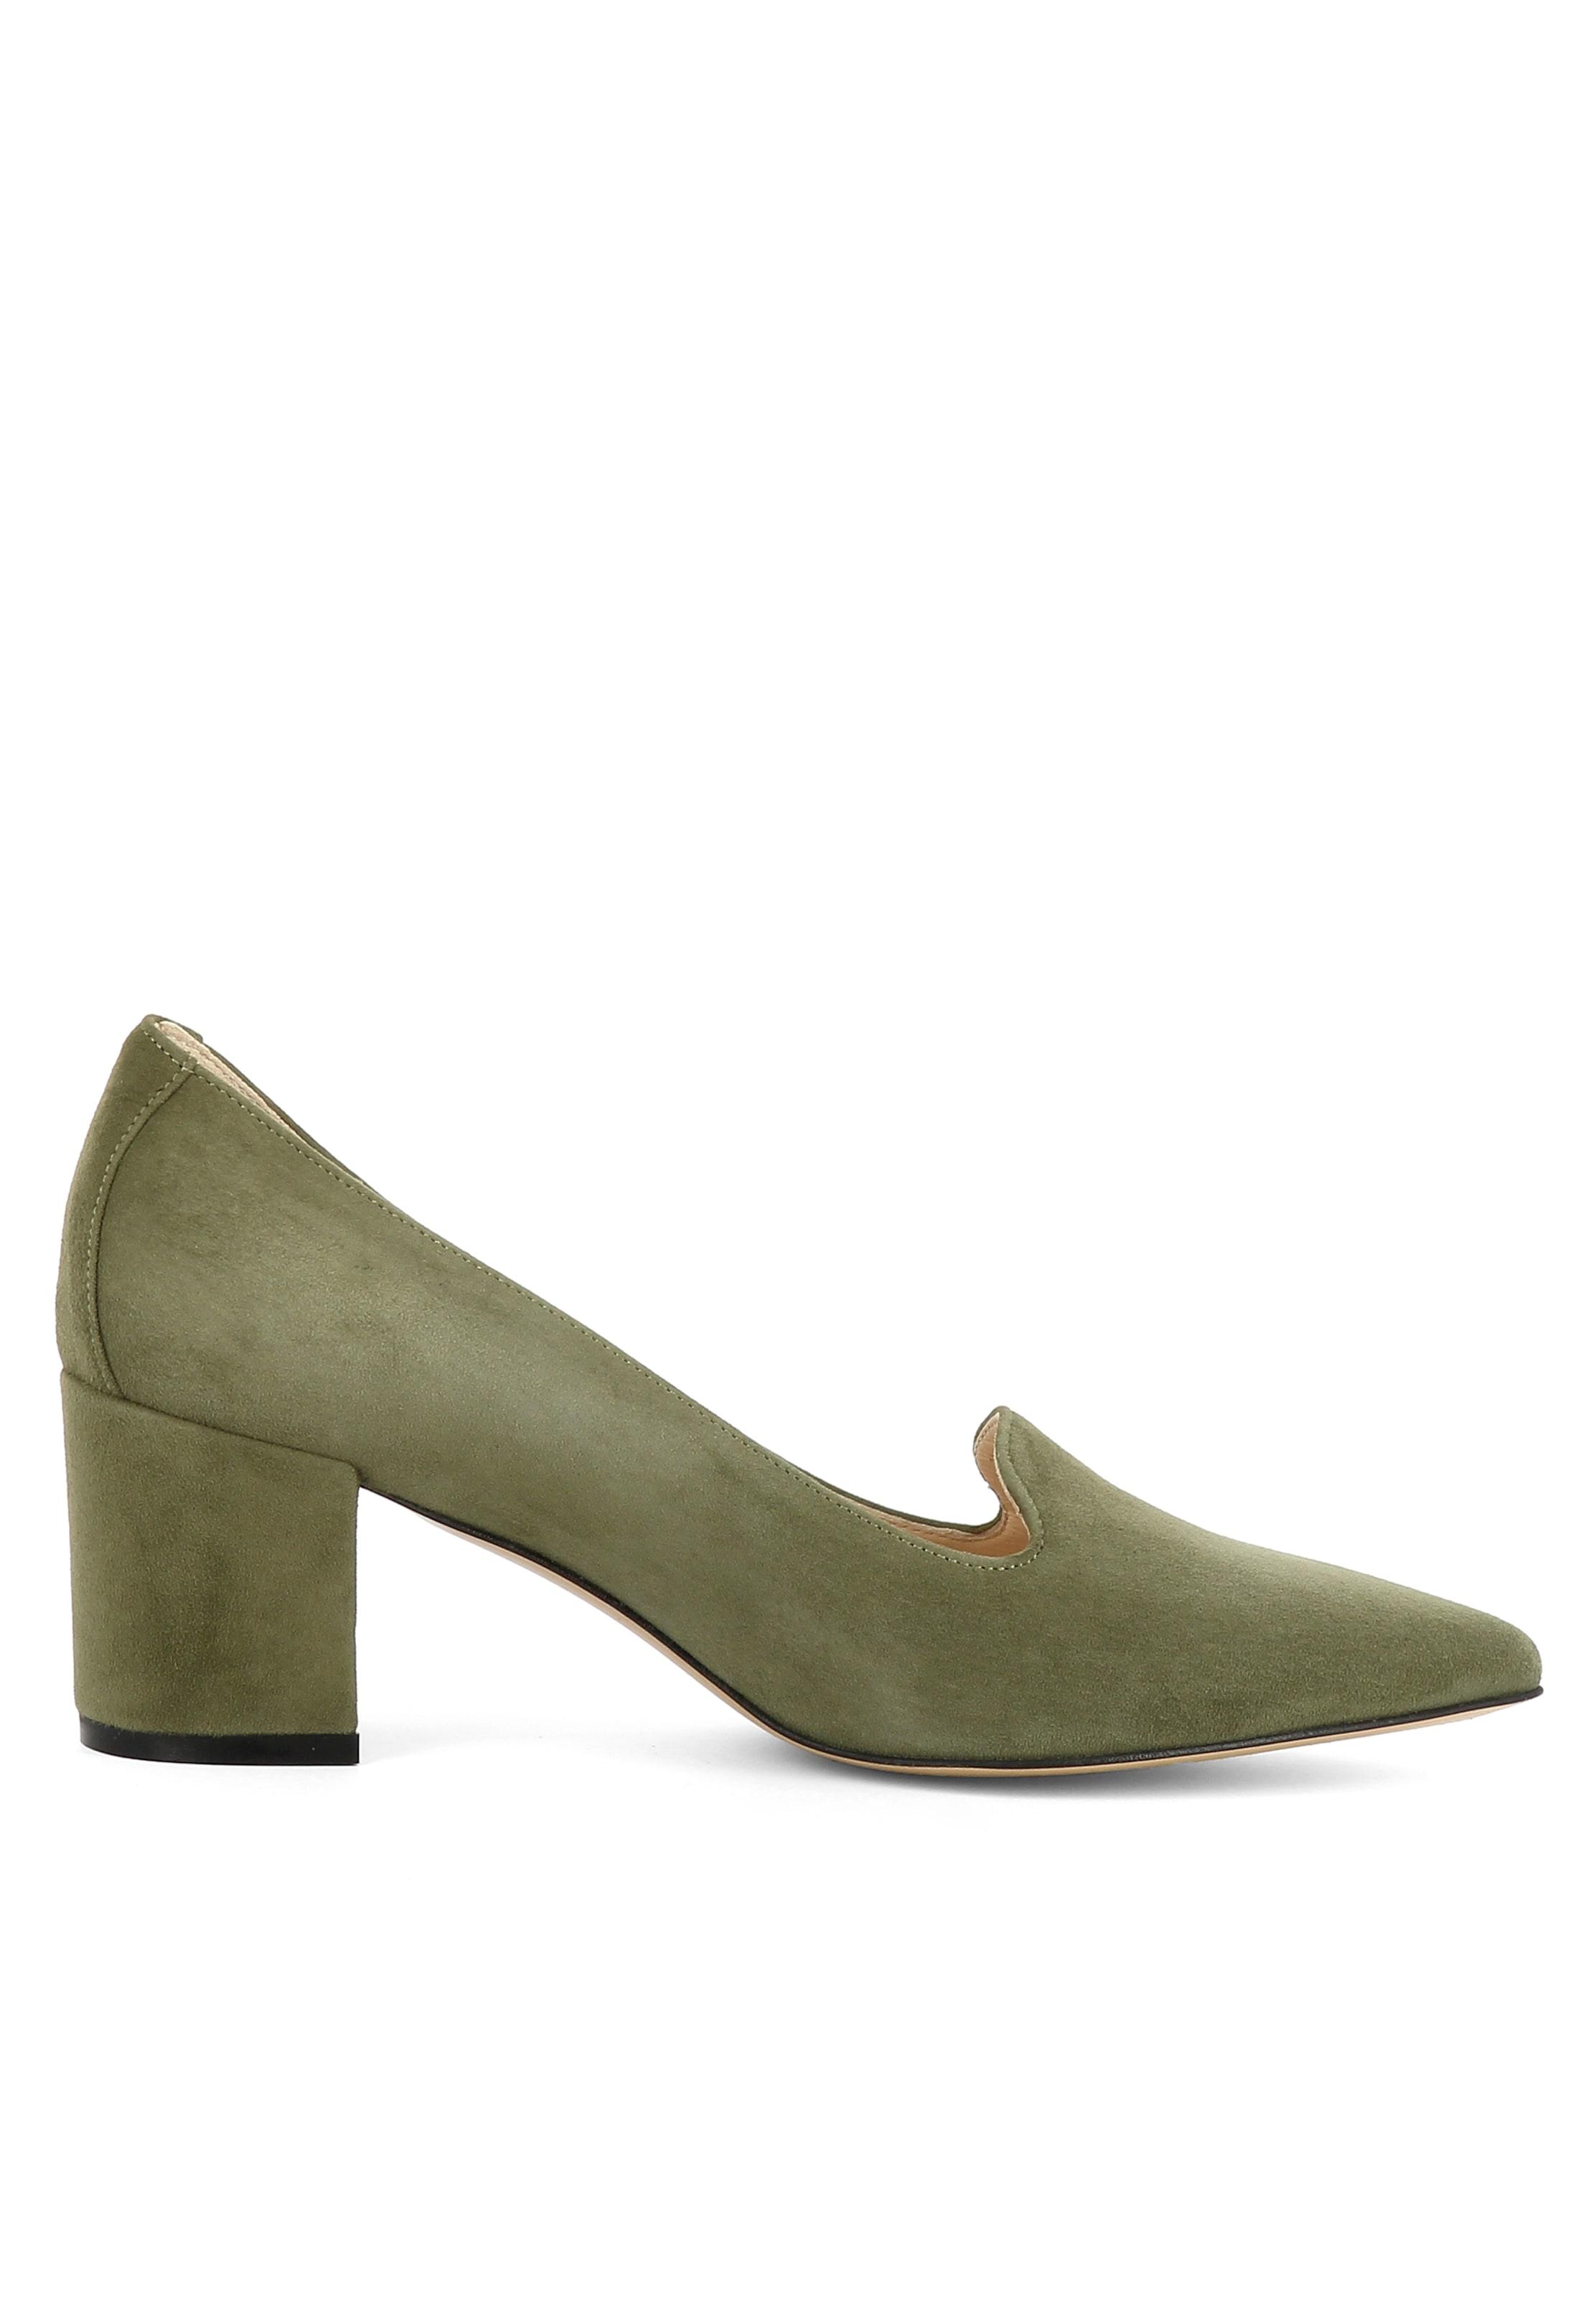 Pompes Chaussures Evita Marron Romina